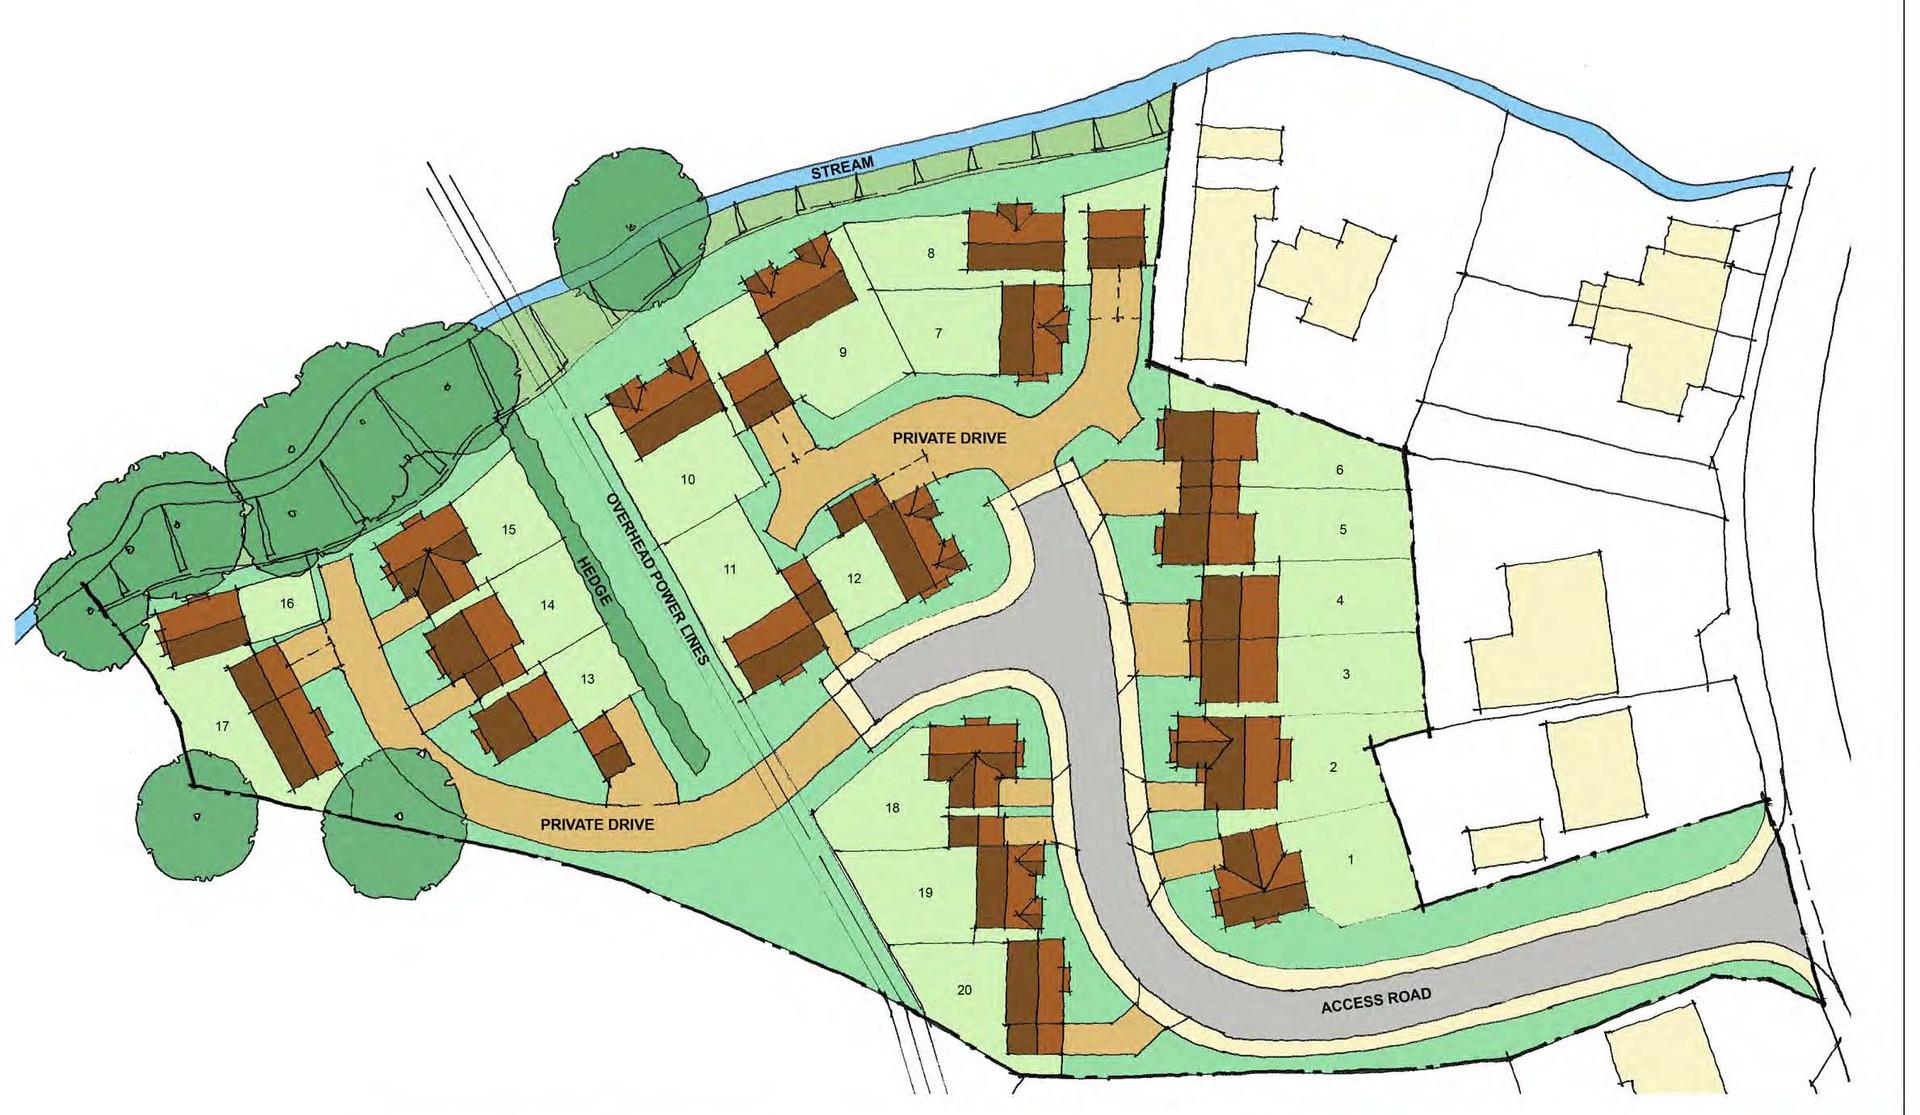 Site plan sketch design 01.jpg